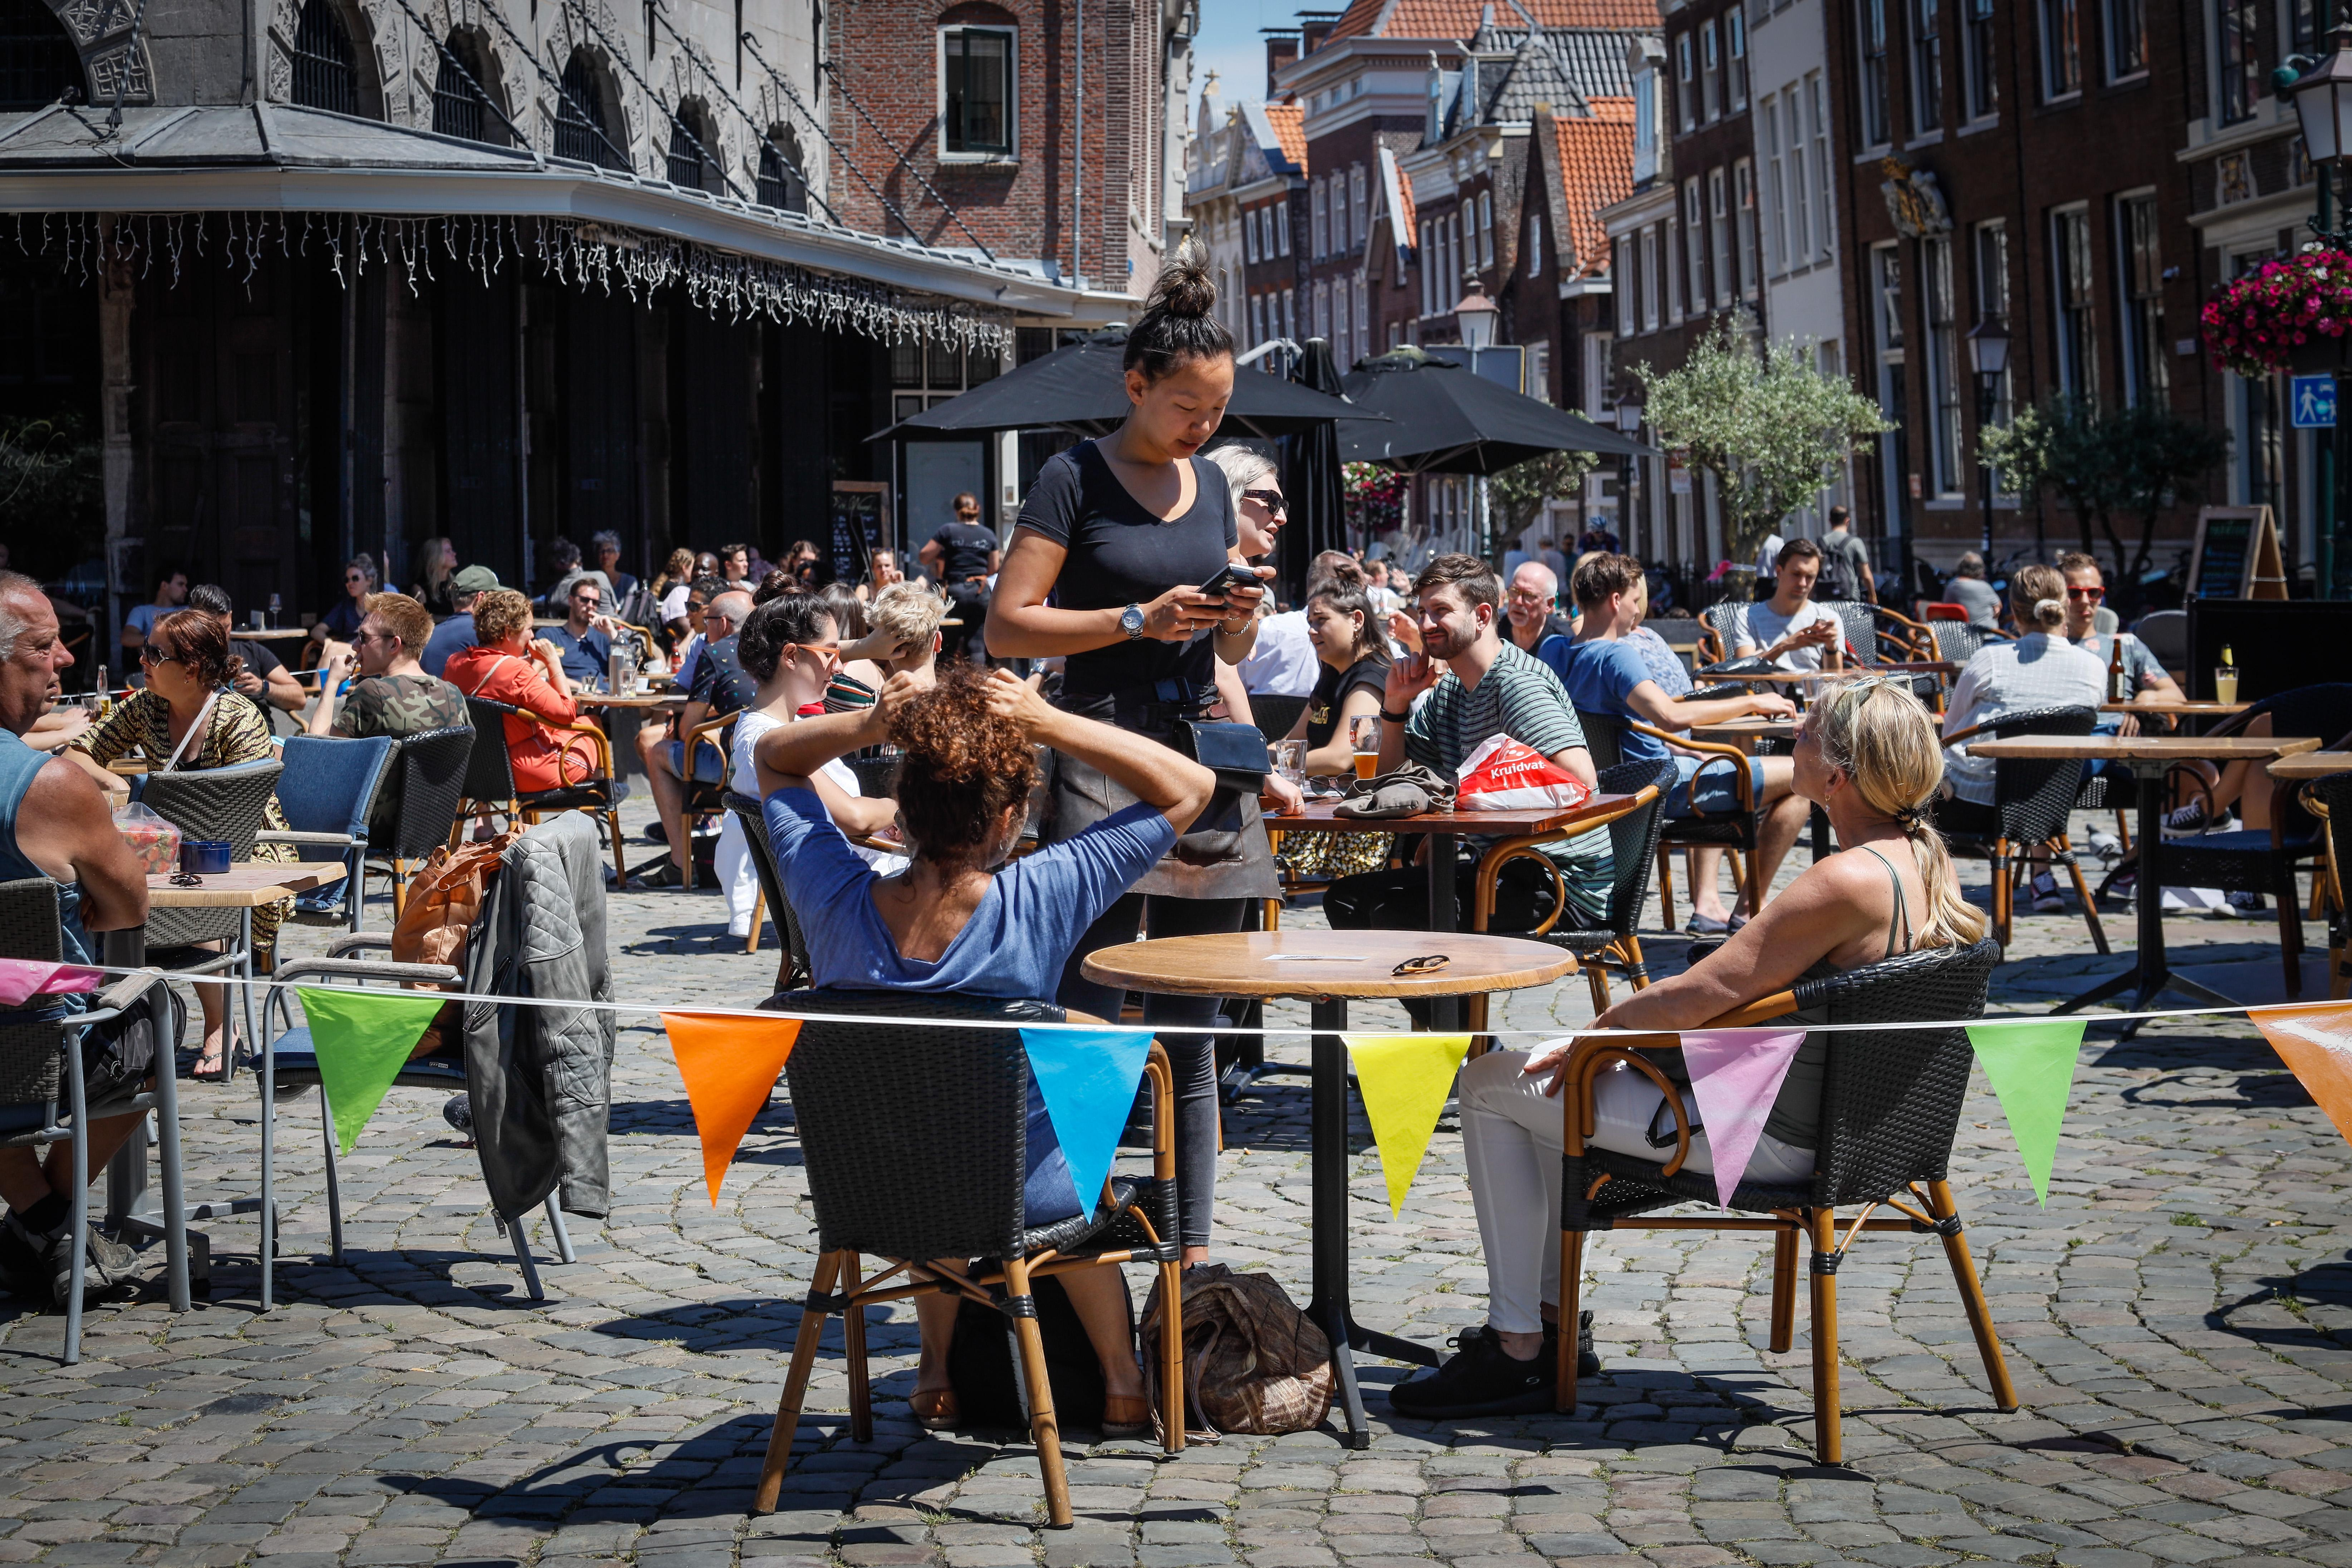 Boetes voor Hoornse horeca die anderhalve meter niet in acht neemt, ondernemers vinden regels 'onwerkbaar'